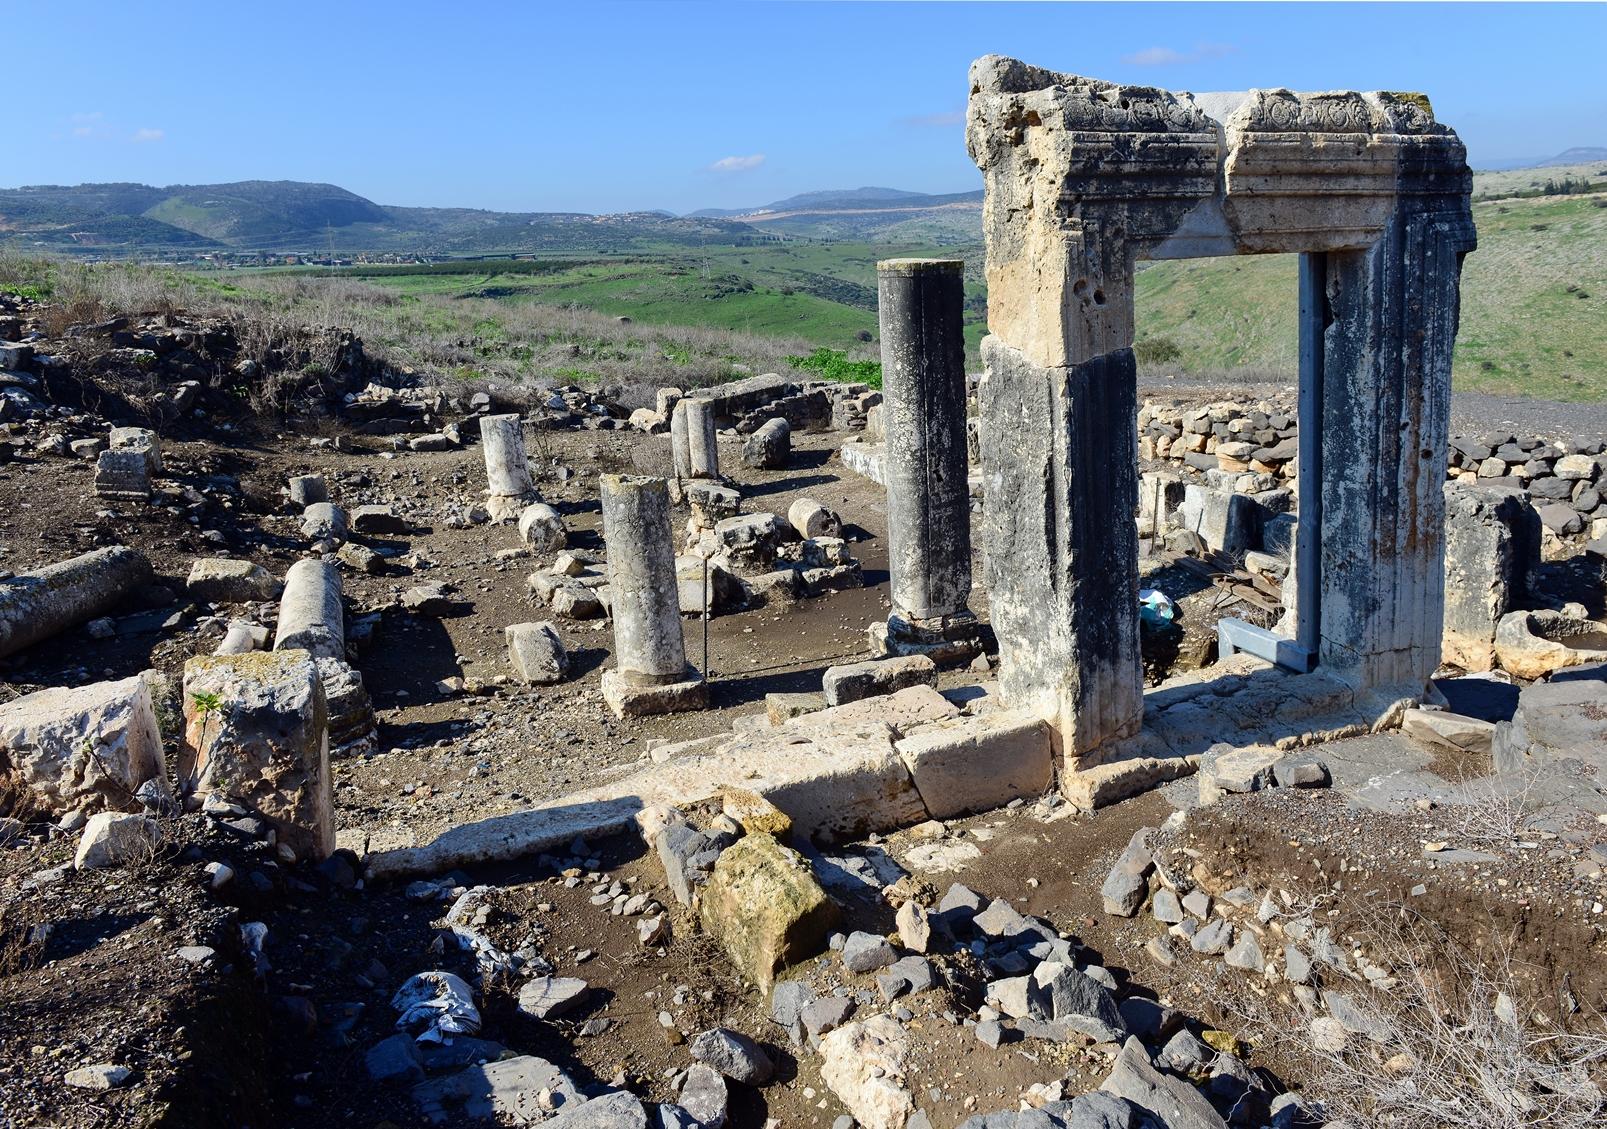 Ruins of an ancient synagogue at Arbel National Park. Photo by Avraham Graicer